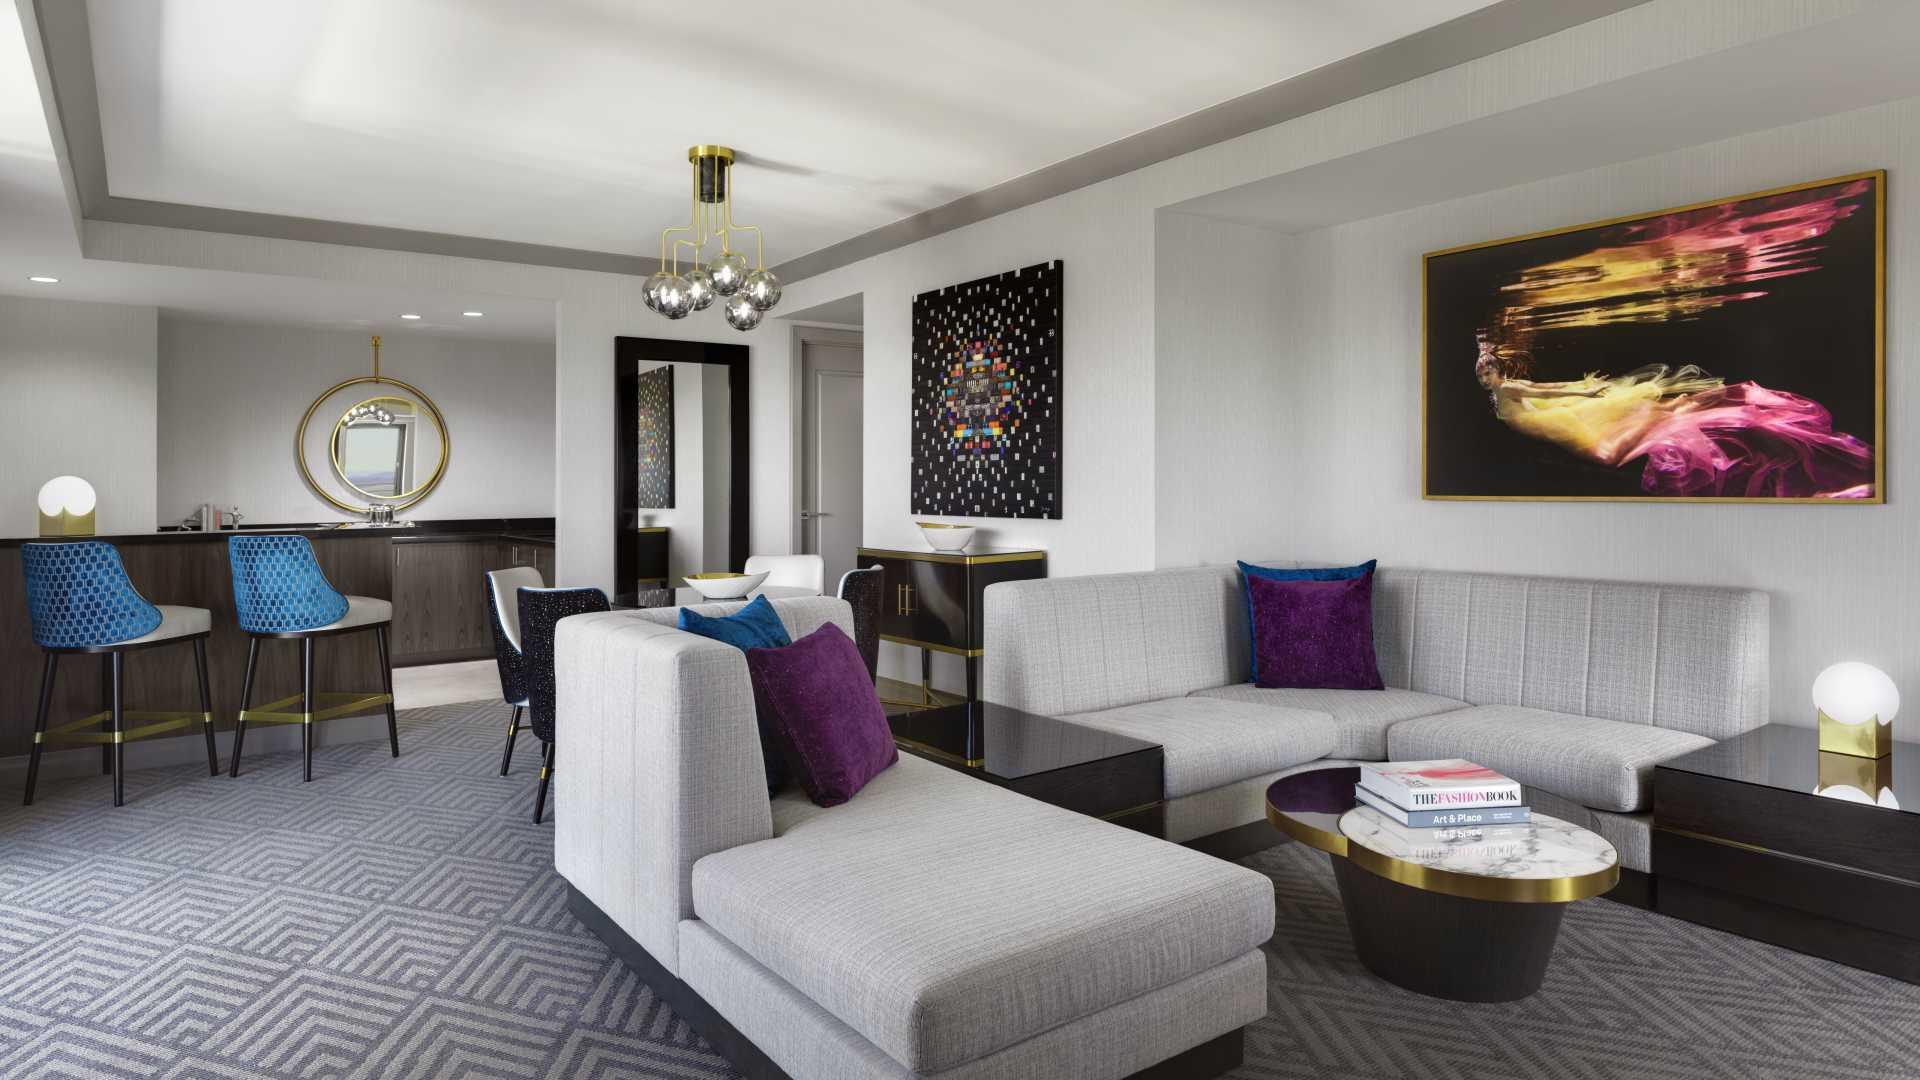 Astounding Las Vegas Wraparound Terrace Suite The Cosmopolitan Andrewgaddart Wooden Chair Designs For Living Room Andrewgaddartcom